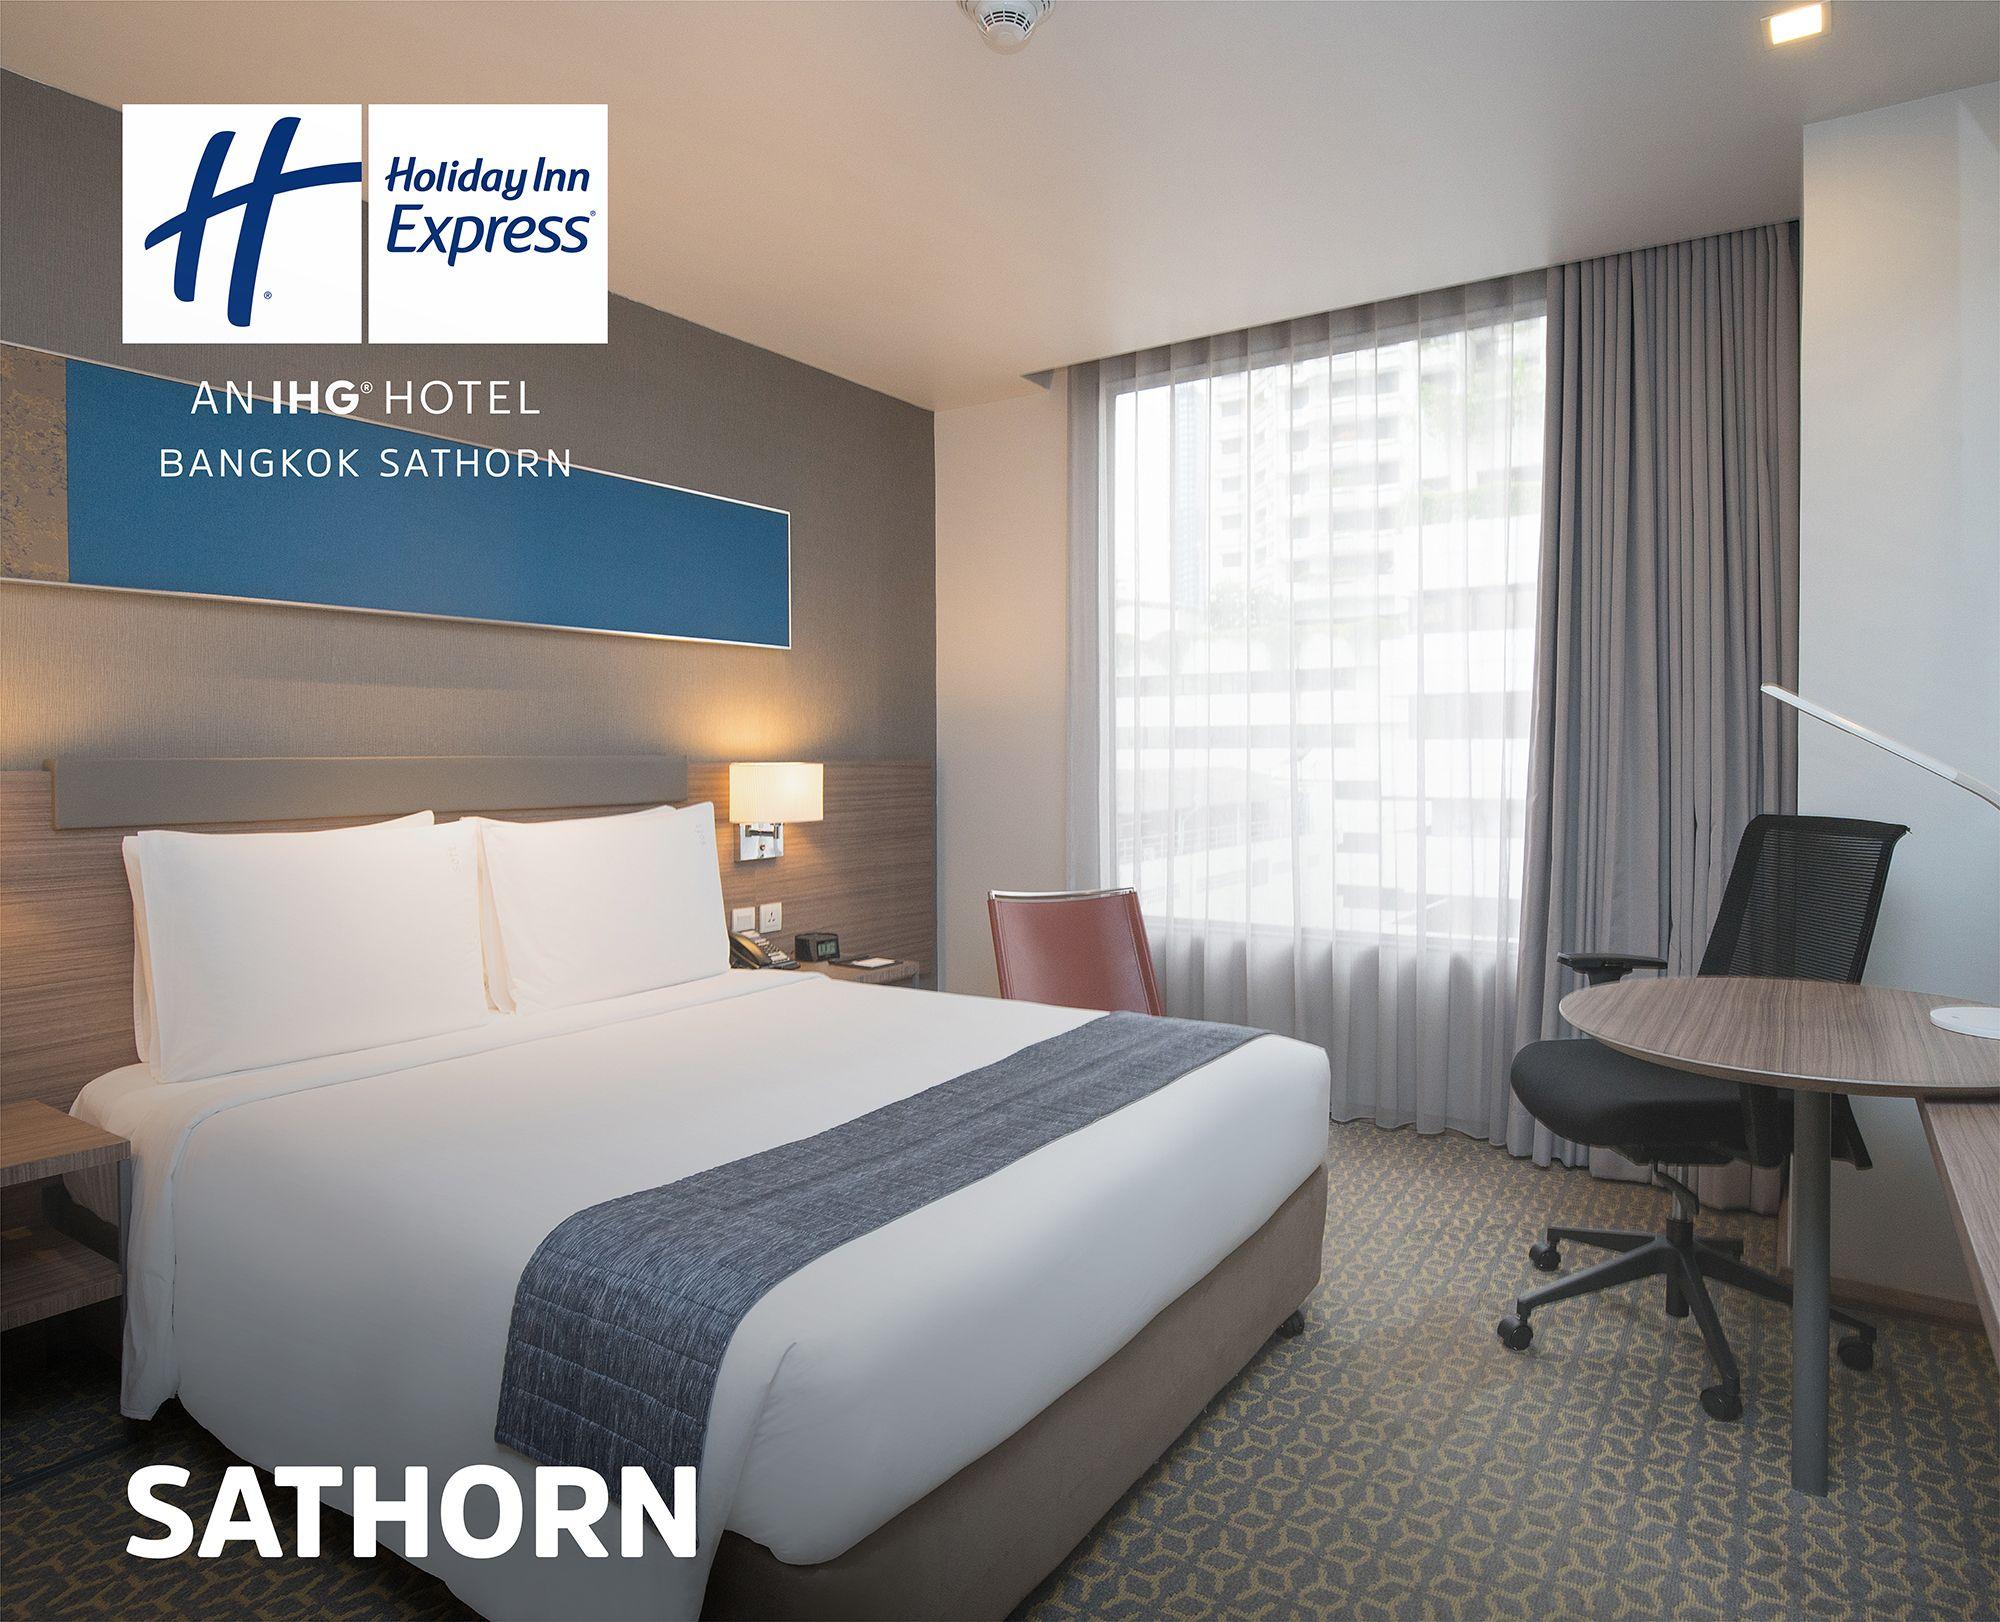 Upto 15 Off On Holiday Inn Express Bangkok Sathorn With Images Holiday Inn Bangkok Travel Thailand Travel Tips